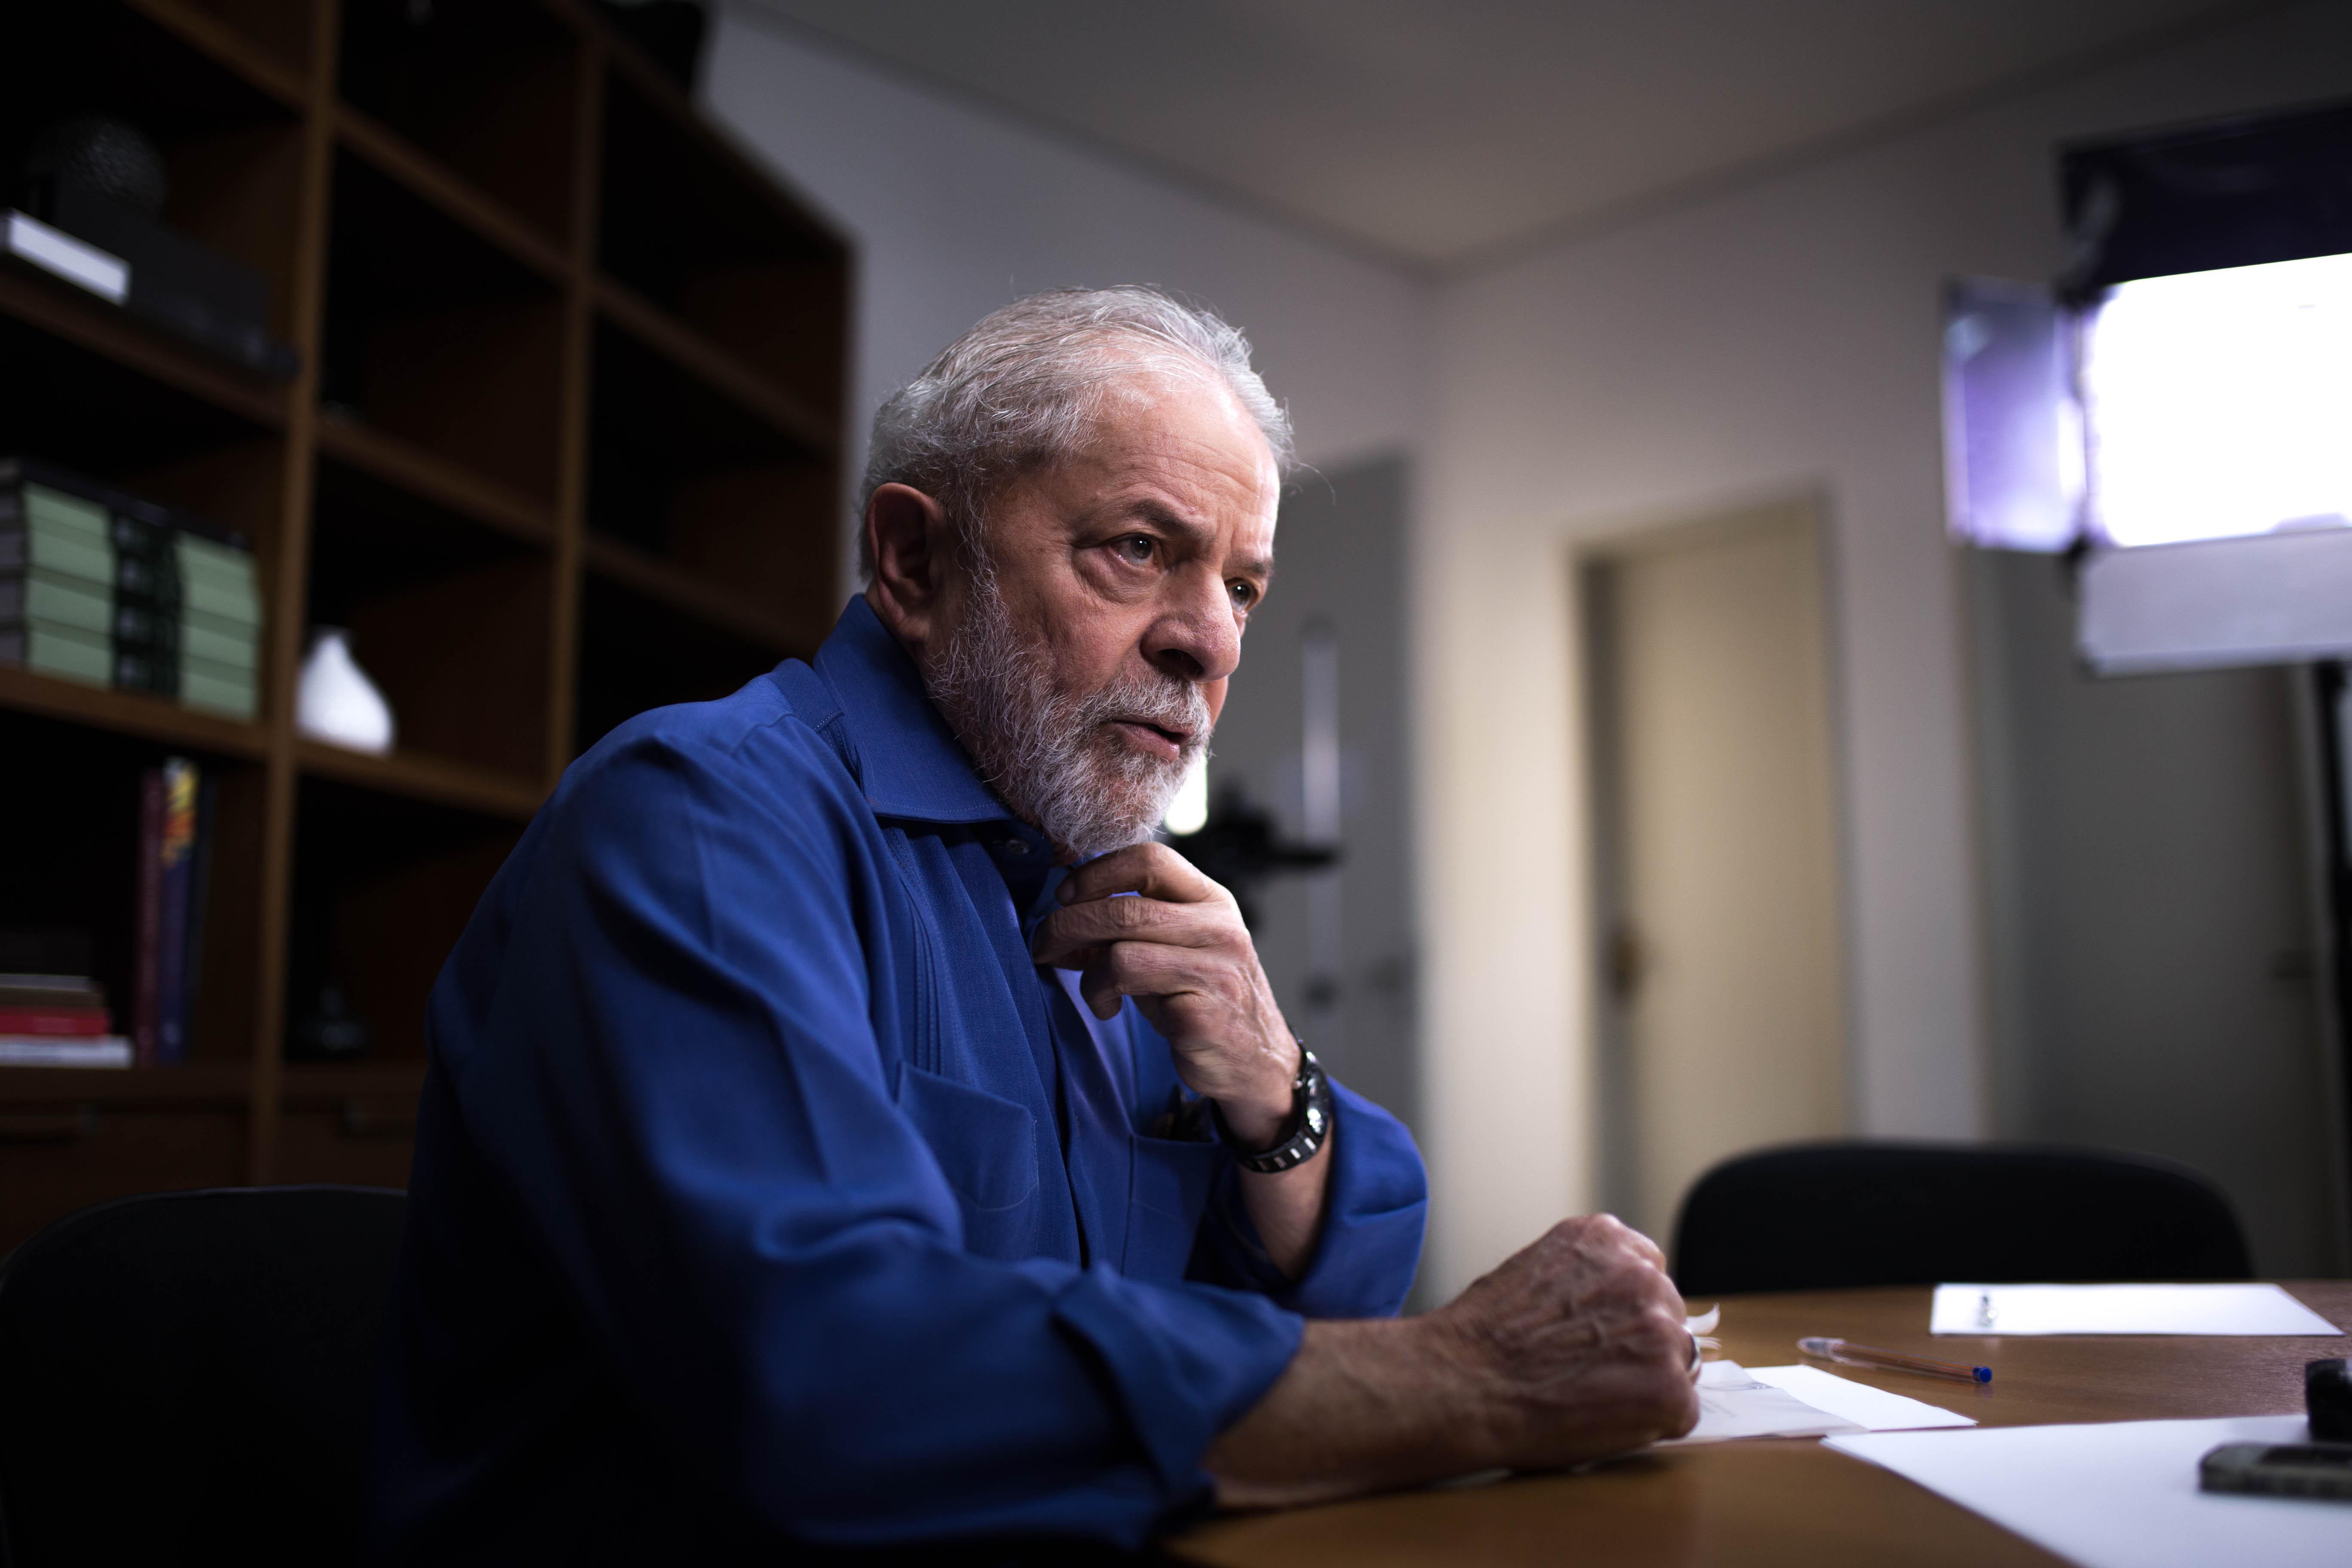 Exclusive: Bolsonaro is turning back the clock on Brazil, says Lula